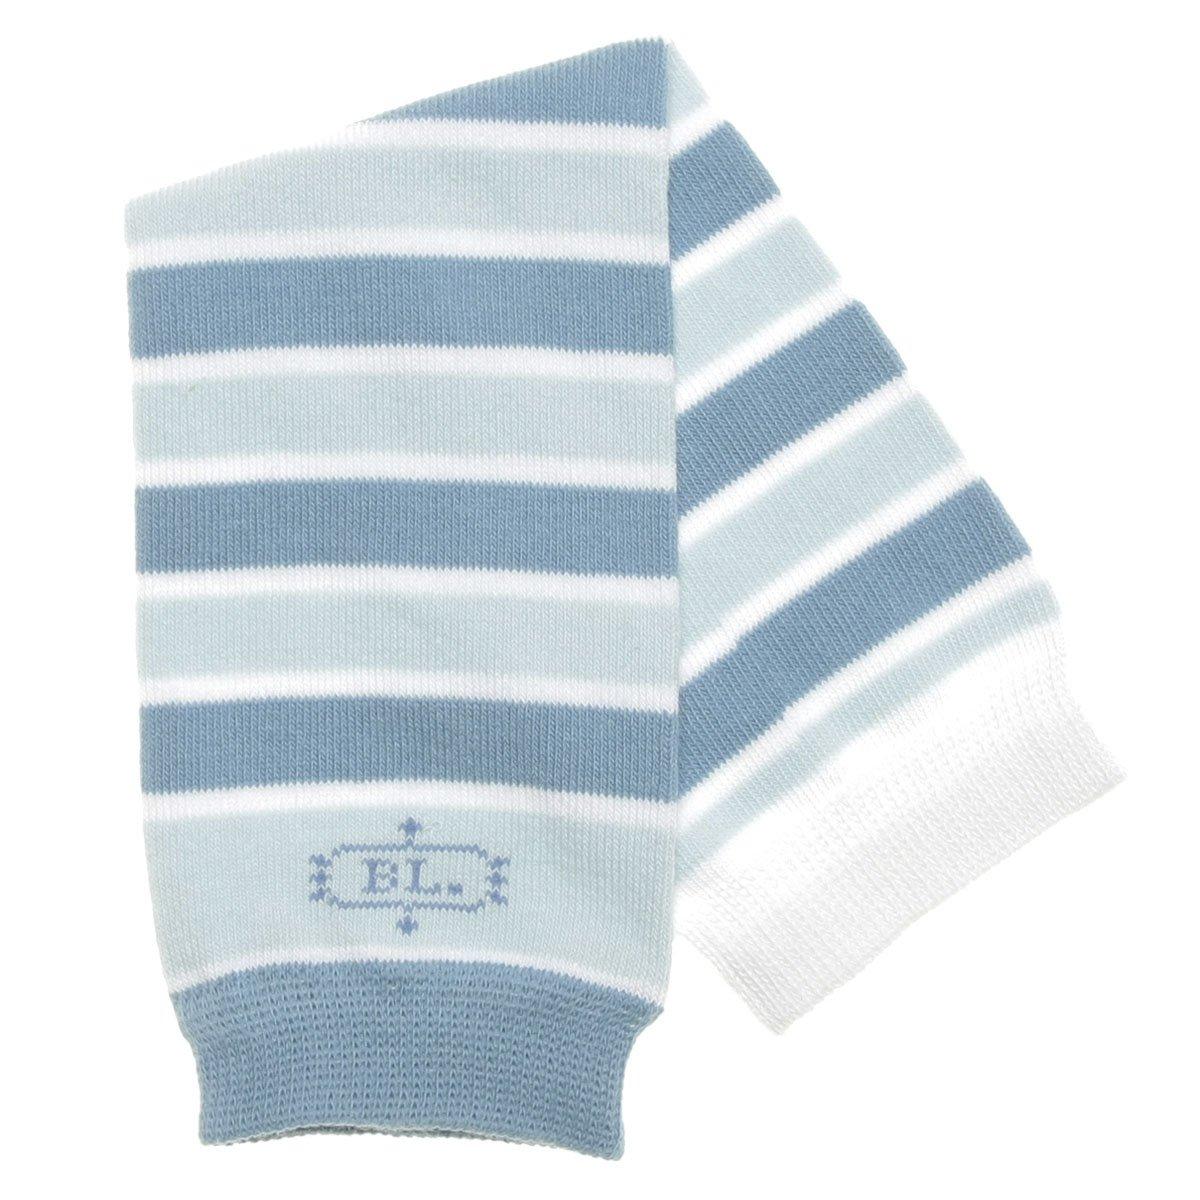 BabyLegs unisex-baby Baby Leg Warmers BabyLegs Leg Warmers Home Run